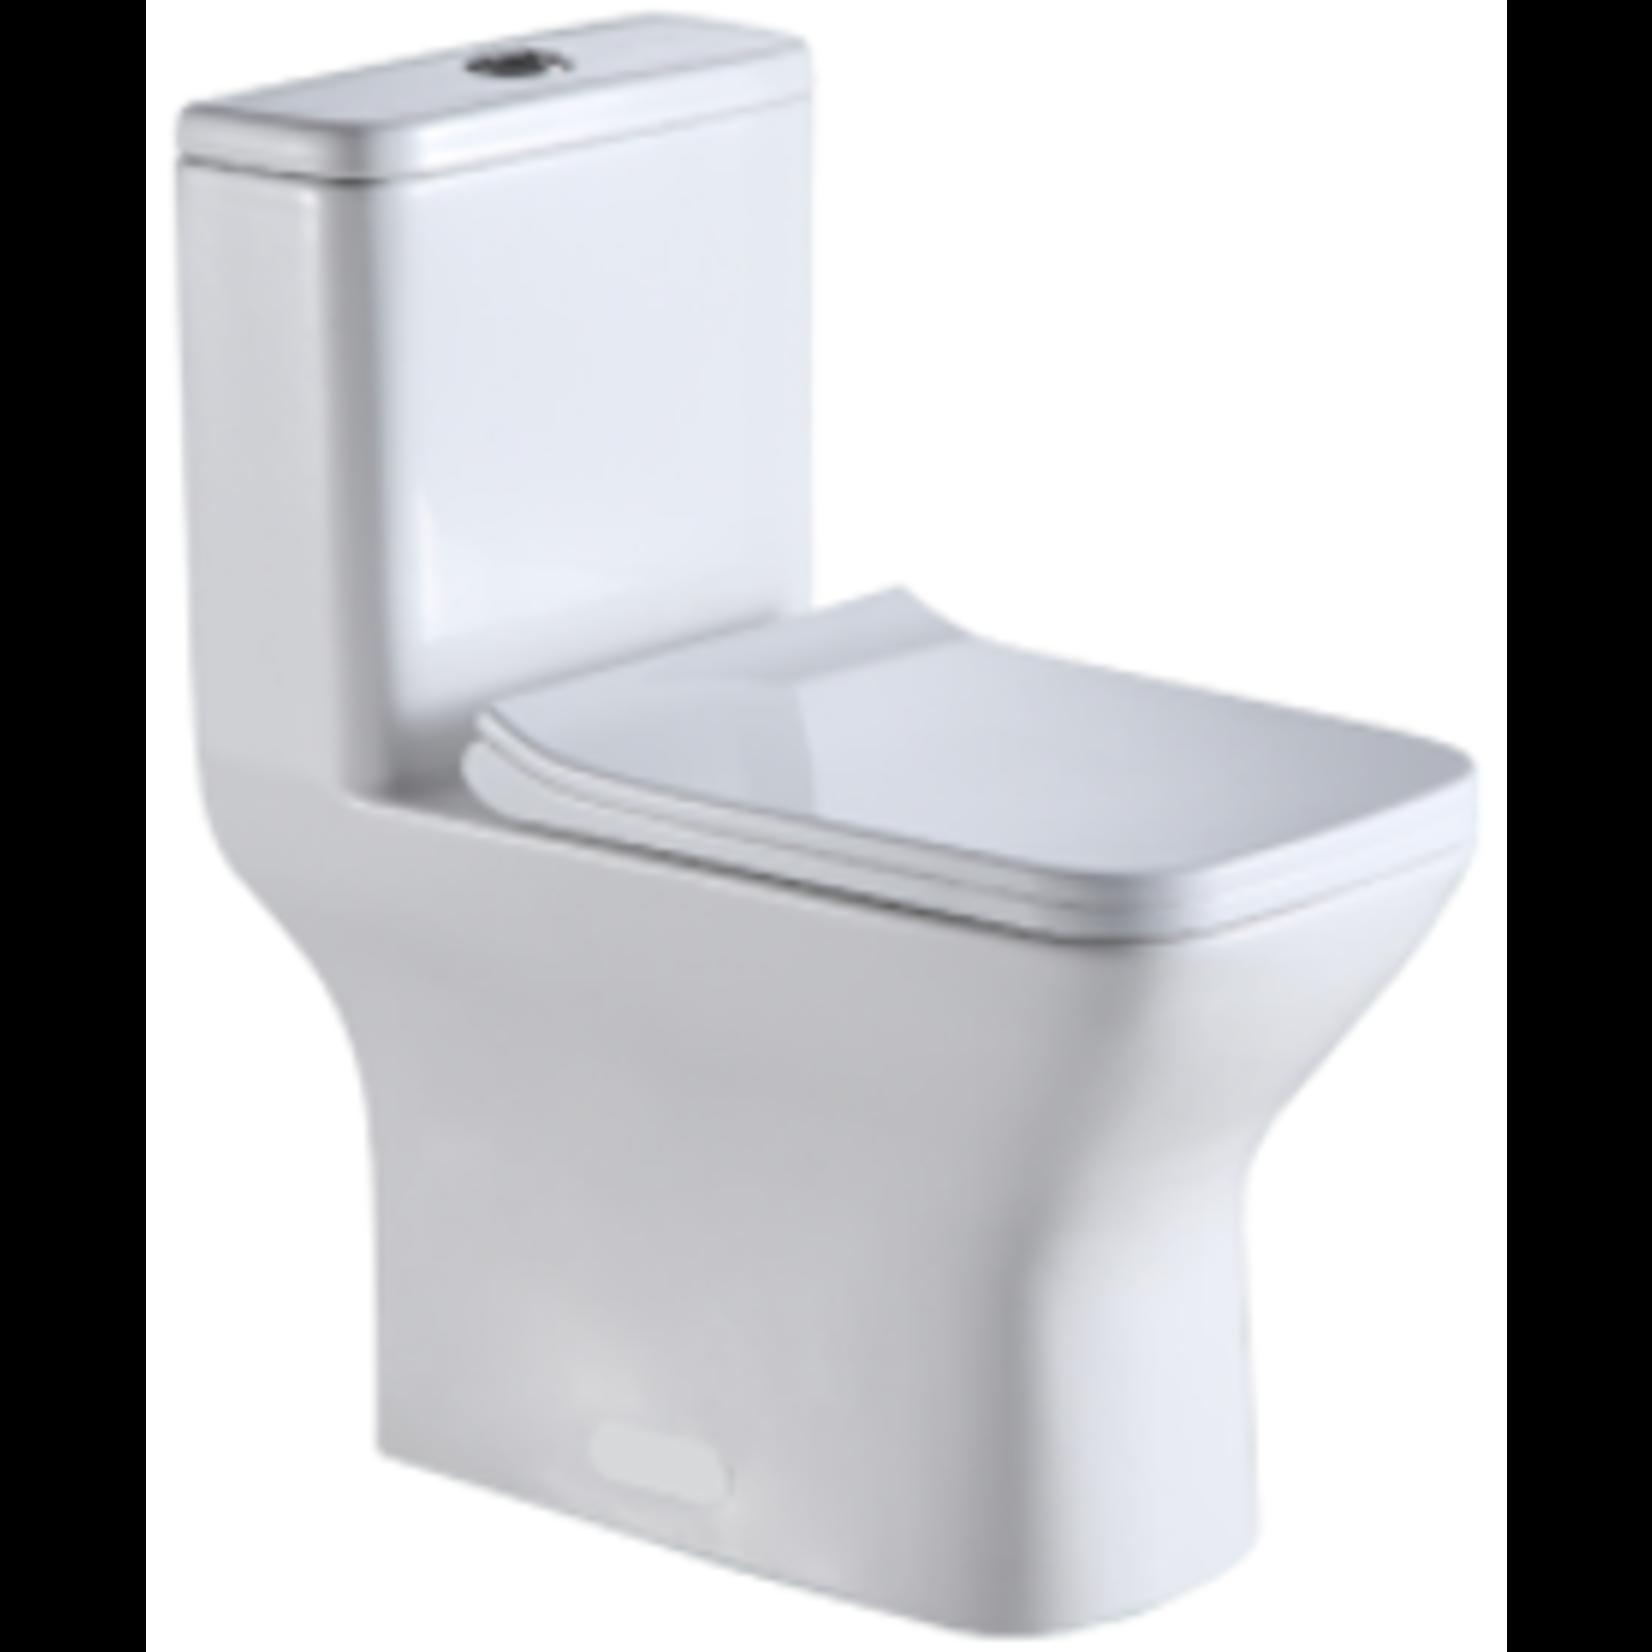 Luhö Toilette monopiece Luho NTD-12248A